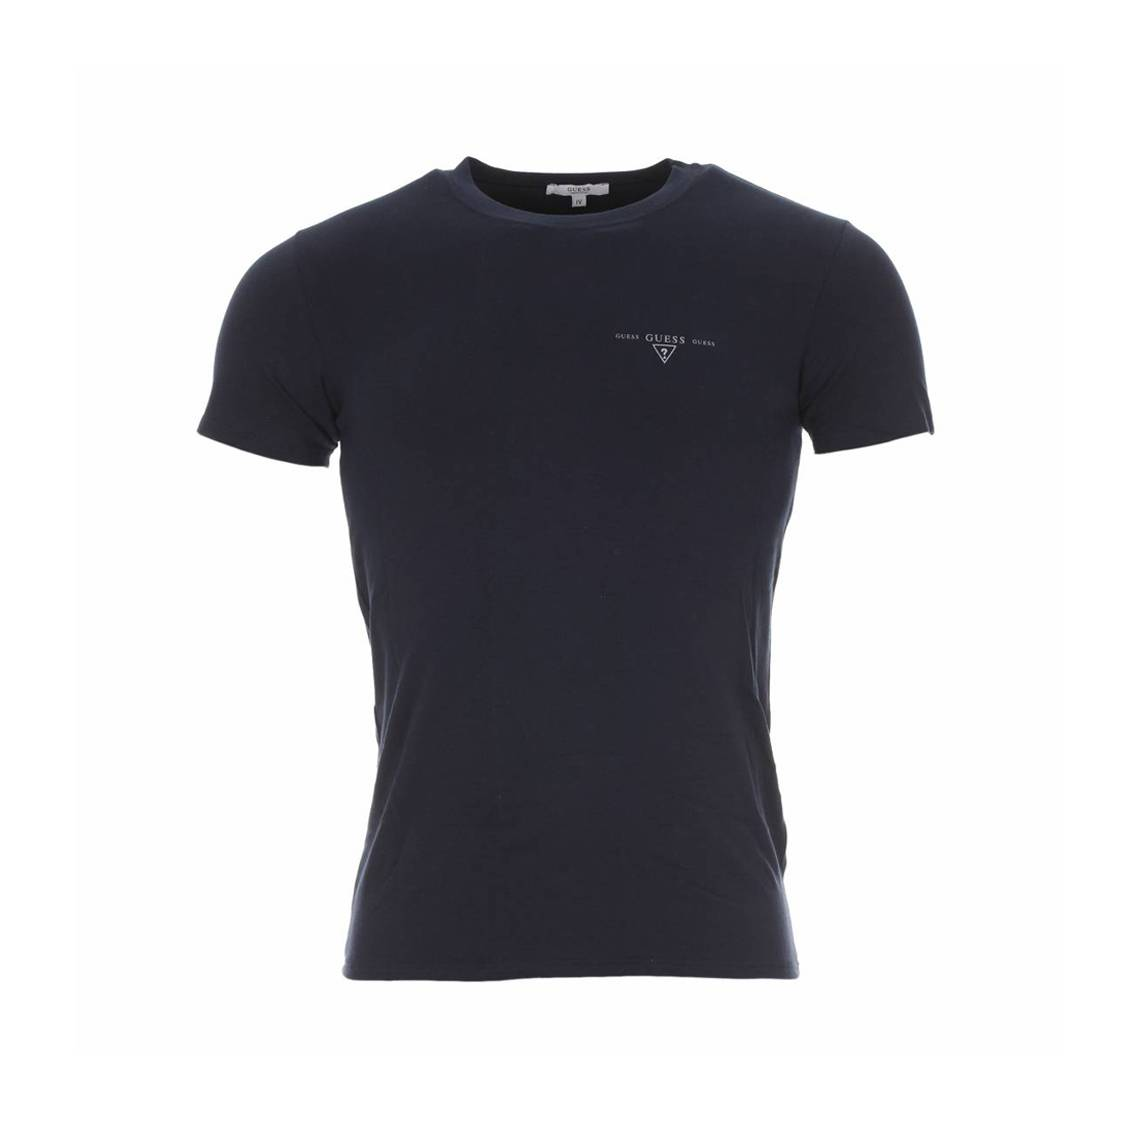 Tee-shirt col rond guess marine